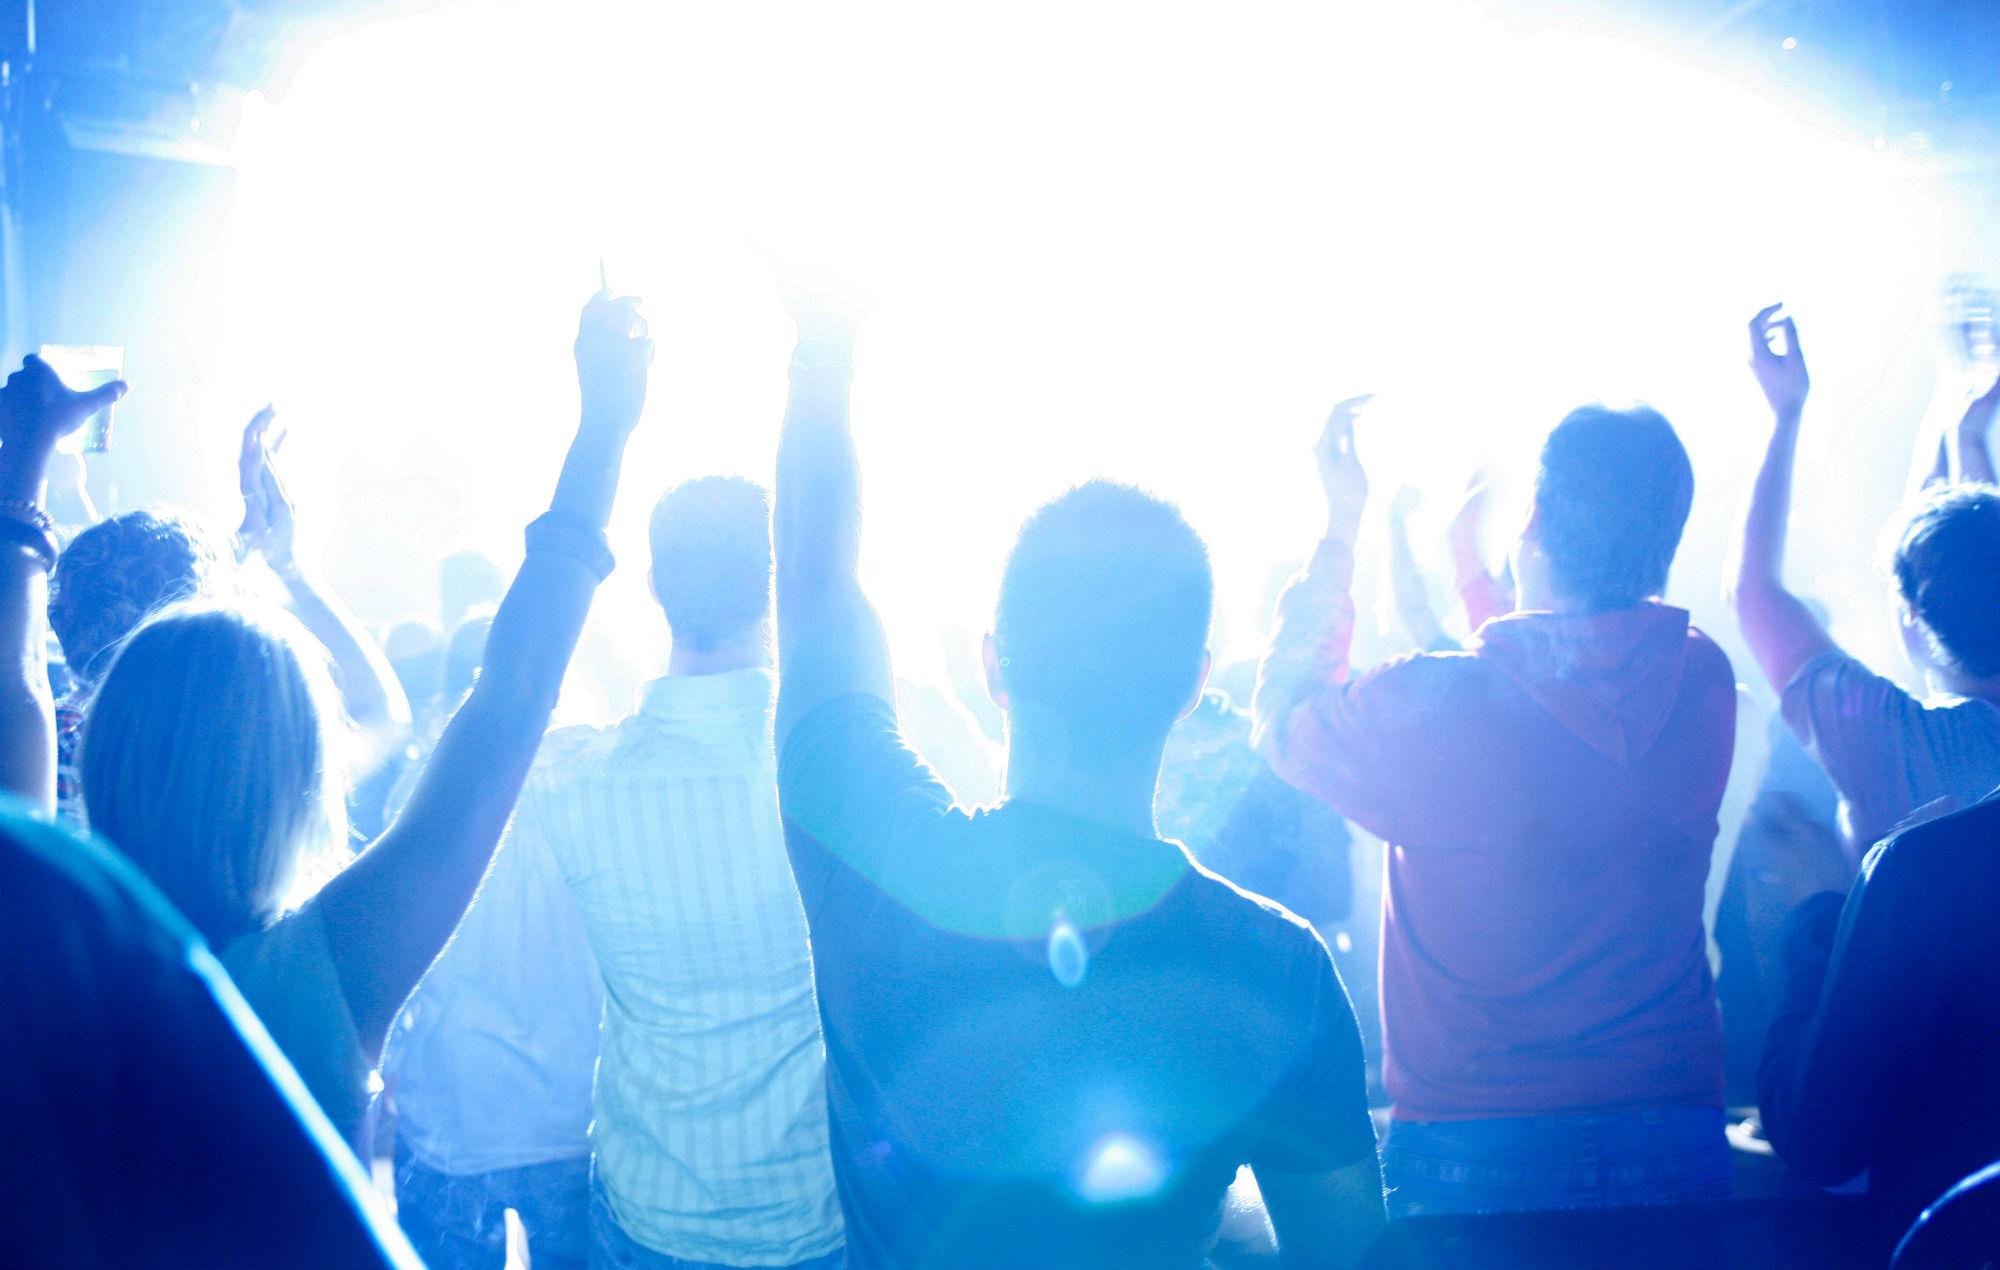 Club rave